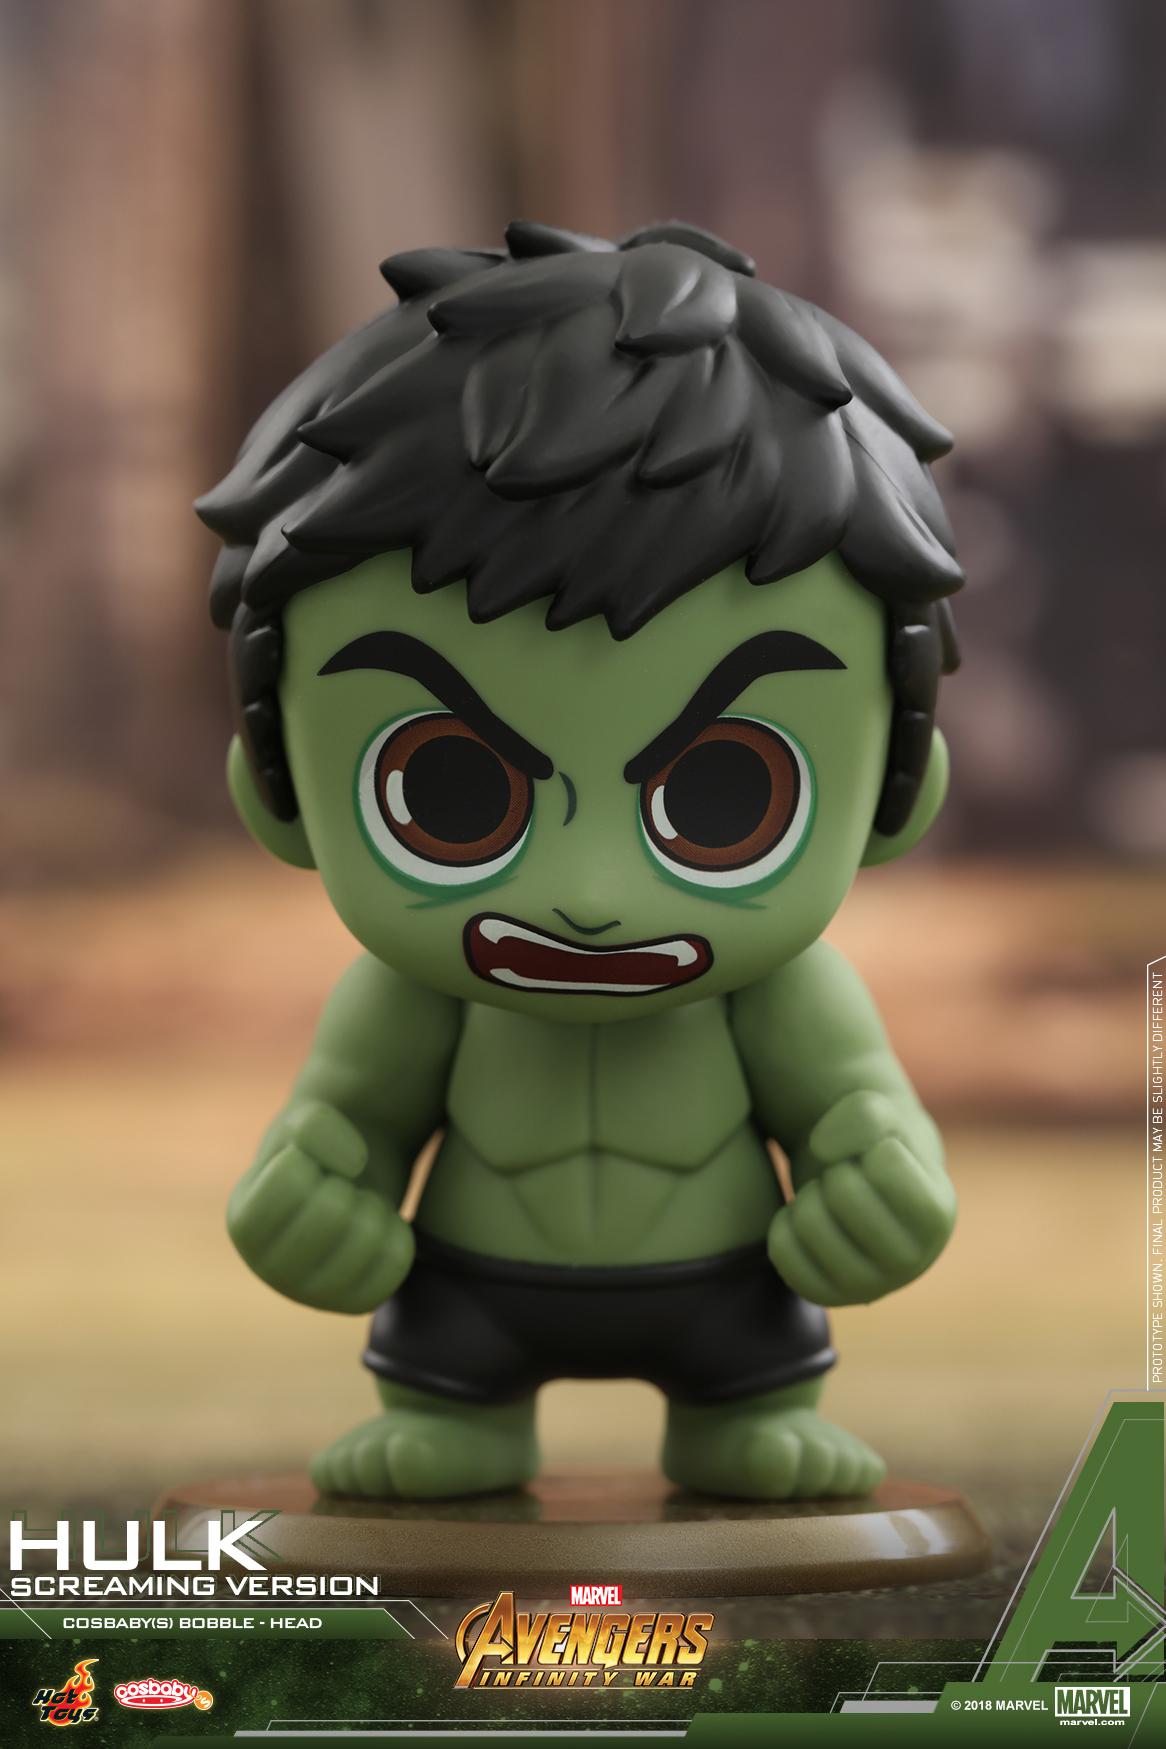 Hot Toys - AIW - Hulk (Screaming Version) Cosbaby (S)_PR1